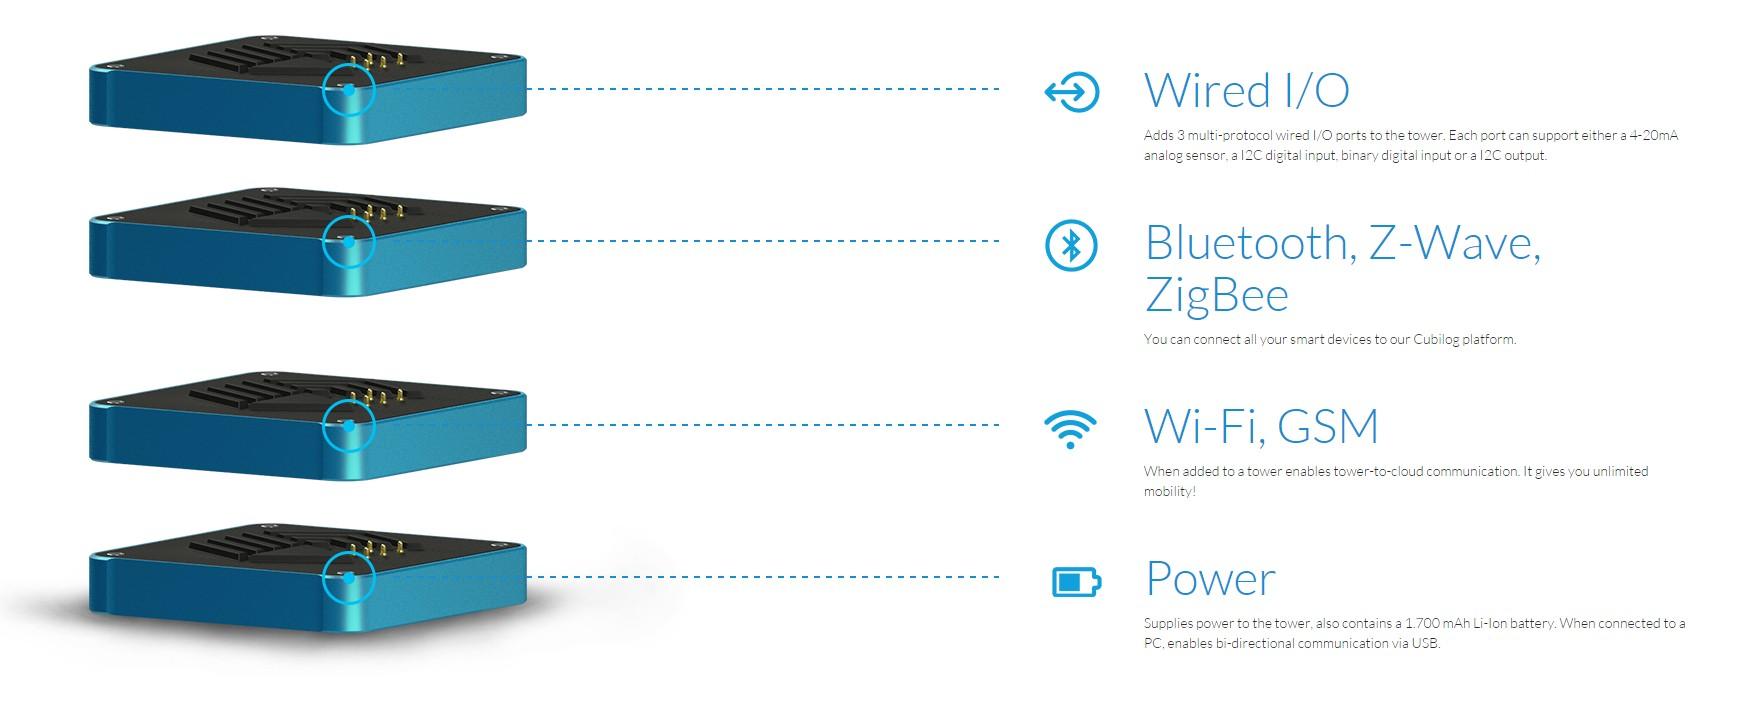 Cubilog Unveils Modular Hub For Flexible Home Automation